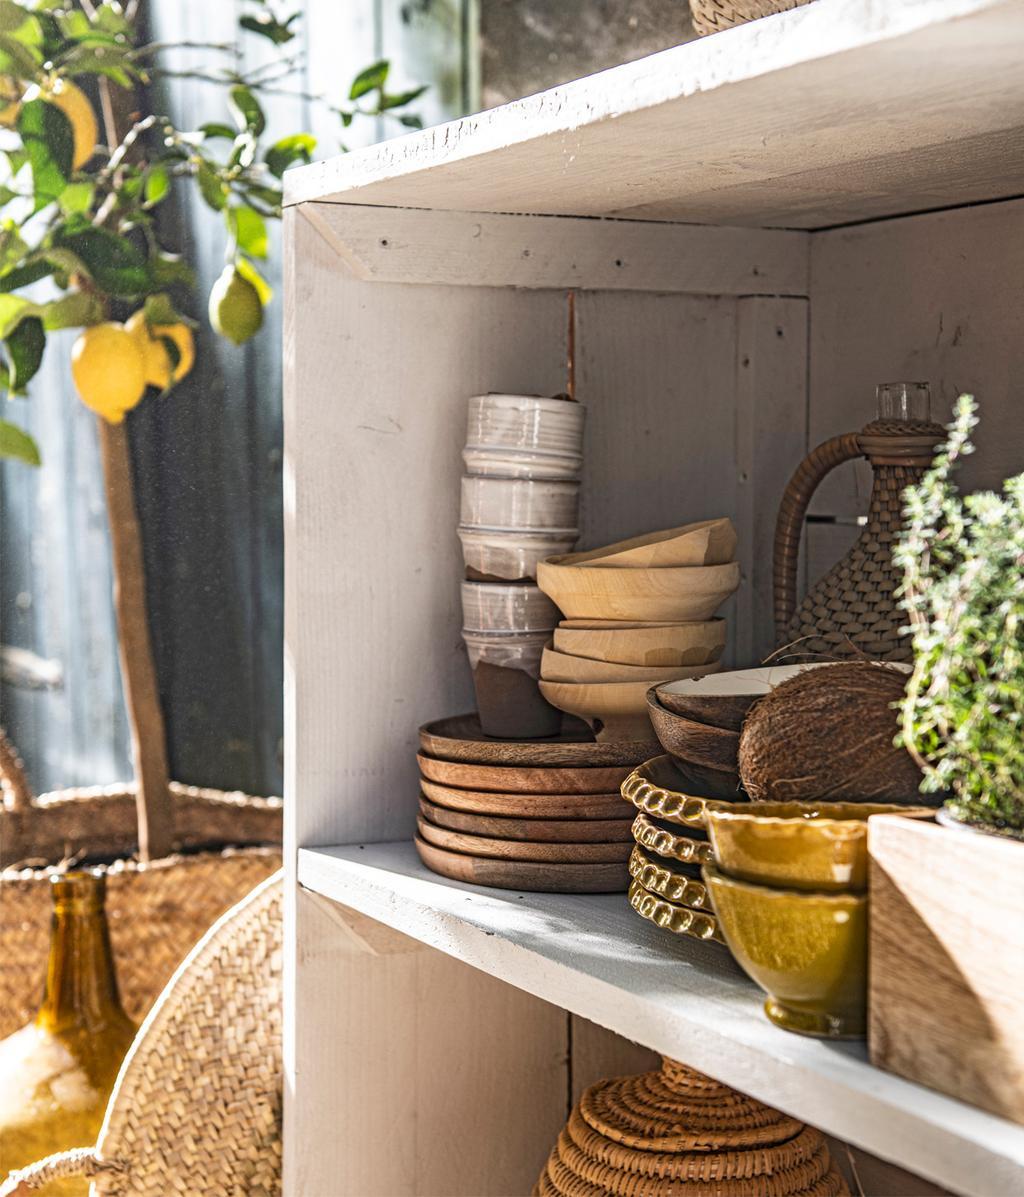 DIY keukenblok | vtwonen